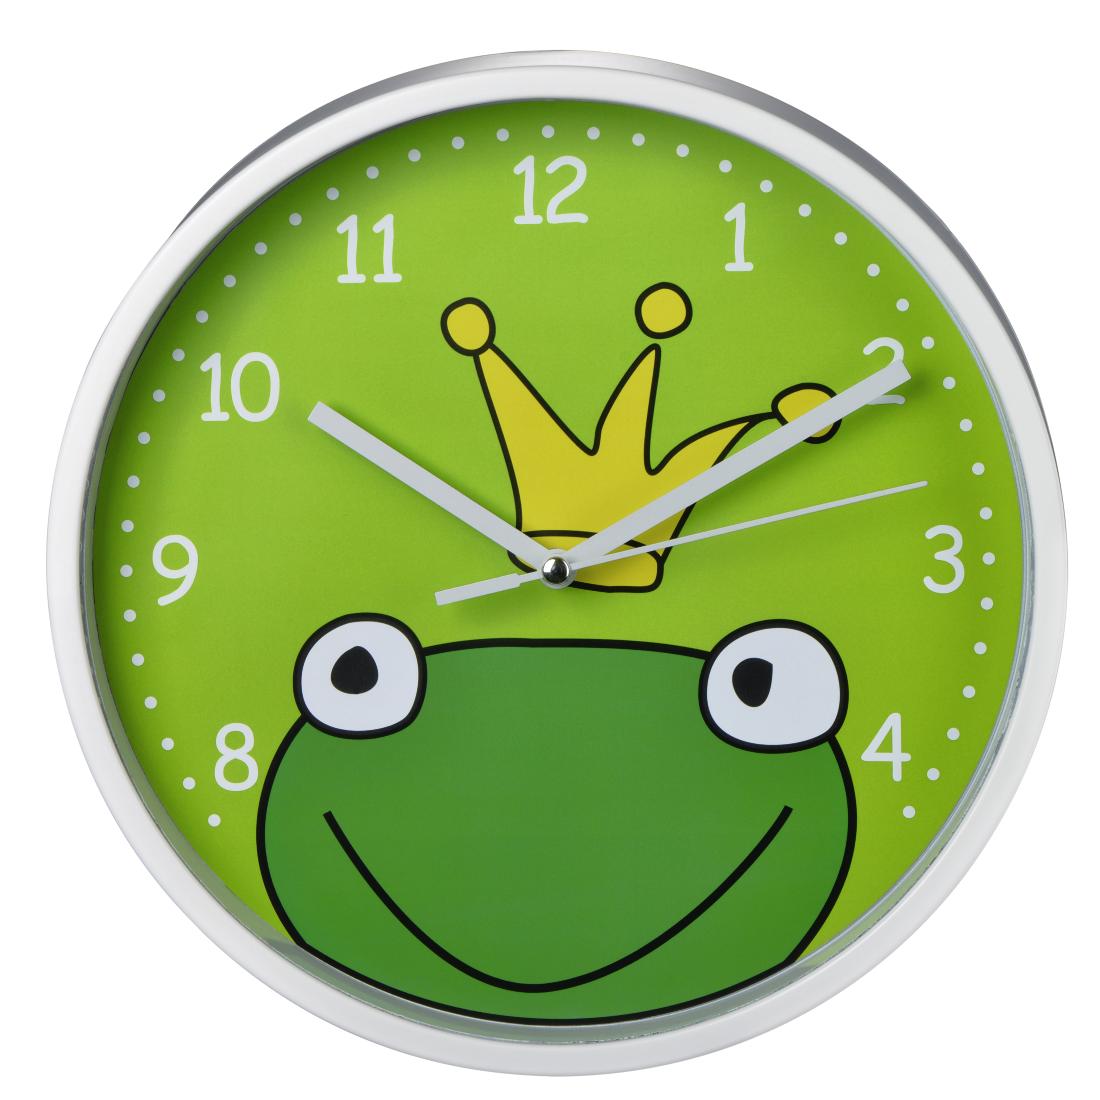 00123172 Hama Frog Prince Childrens Wall Clock Silent Hama